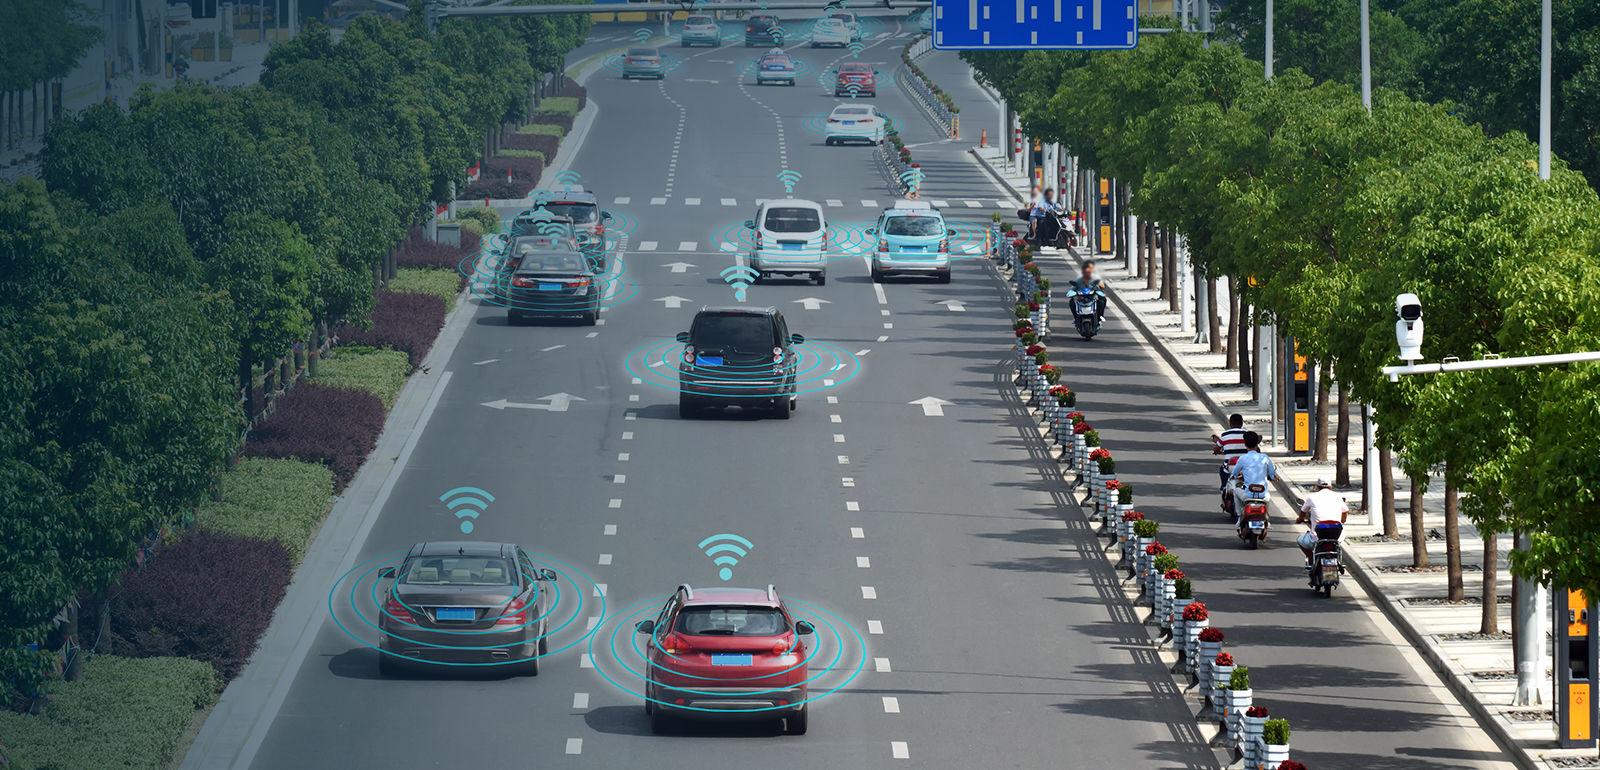 GPS Vehicle Tracking System & Fleet Management System